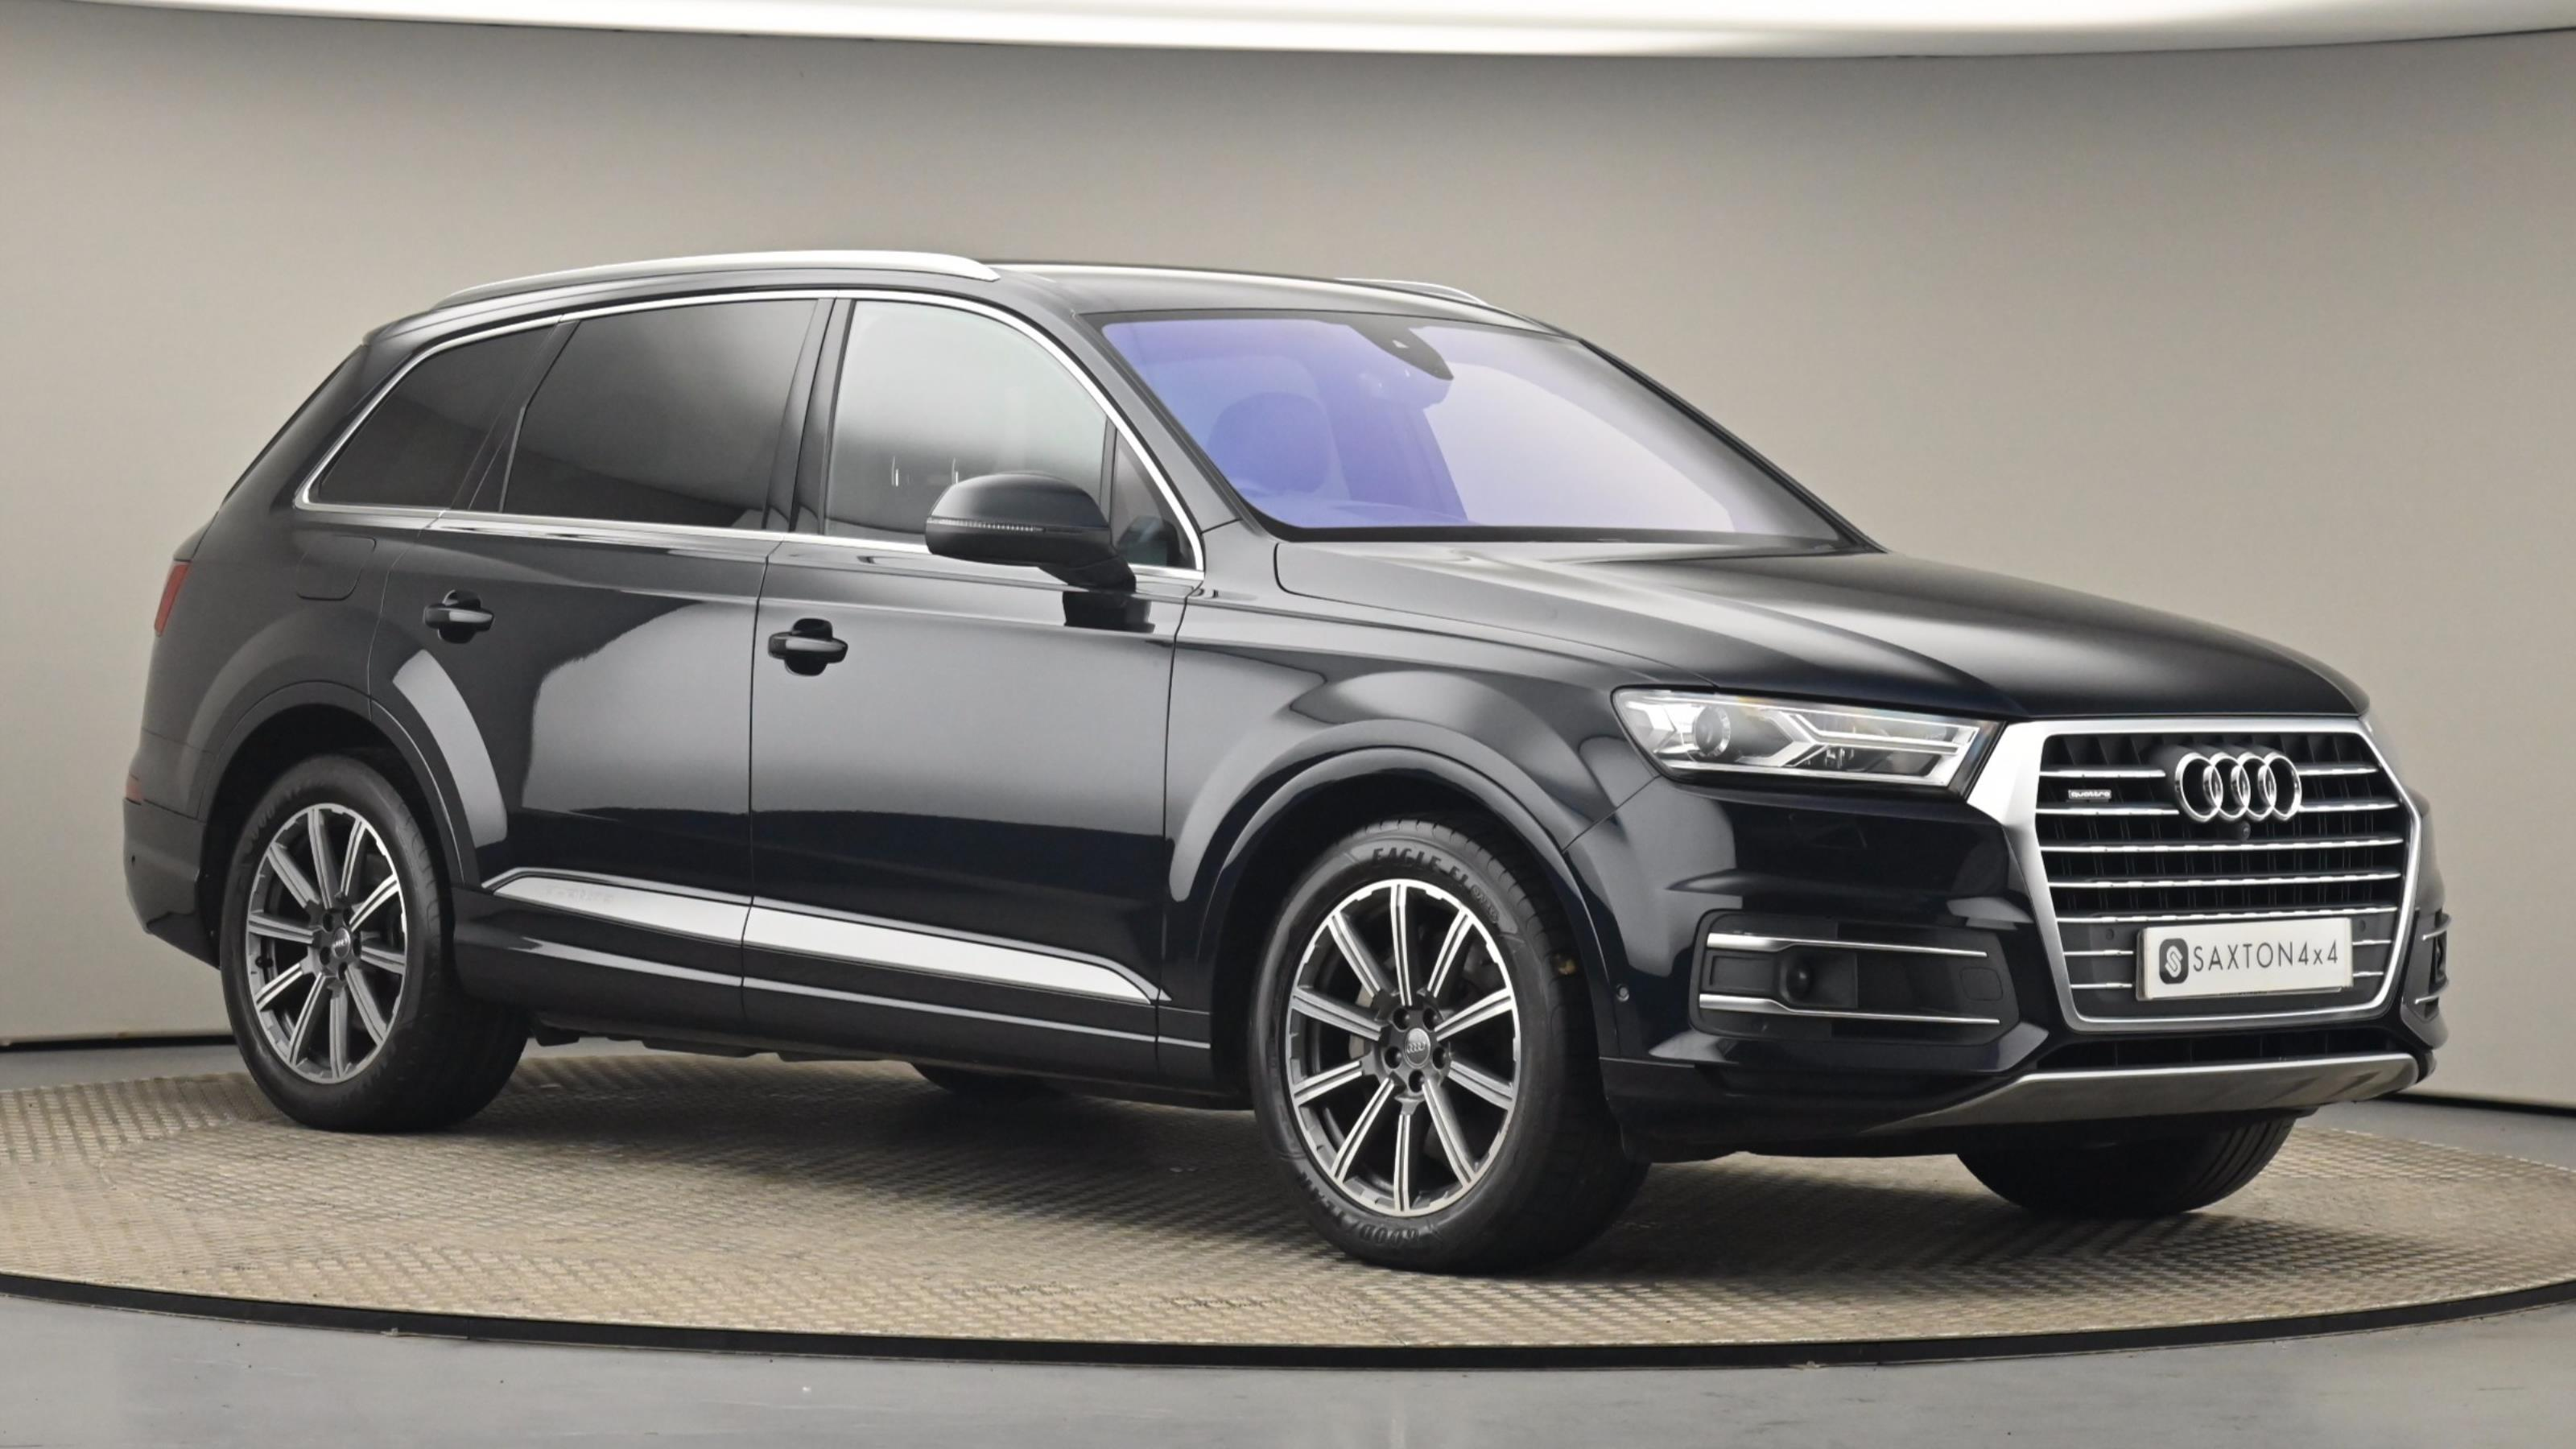 Used 2016 Audi Q7 3.0 TDI Quattro SE 5dr Tip Auto BLUE at Saxton4x4